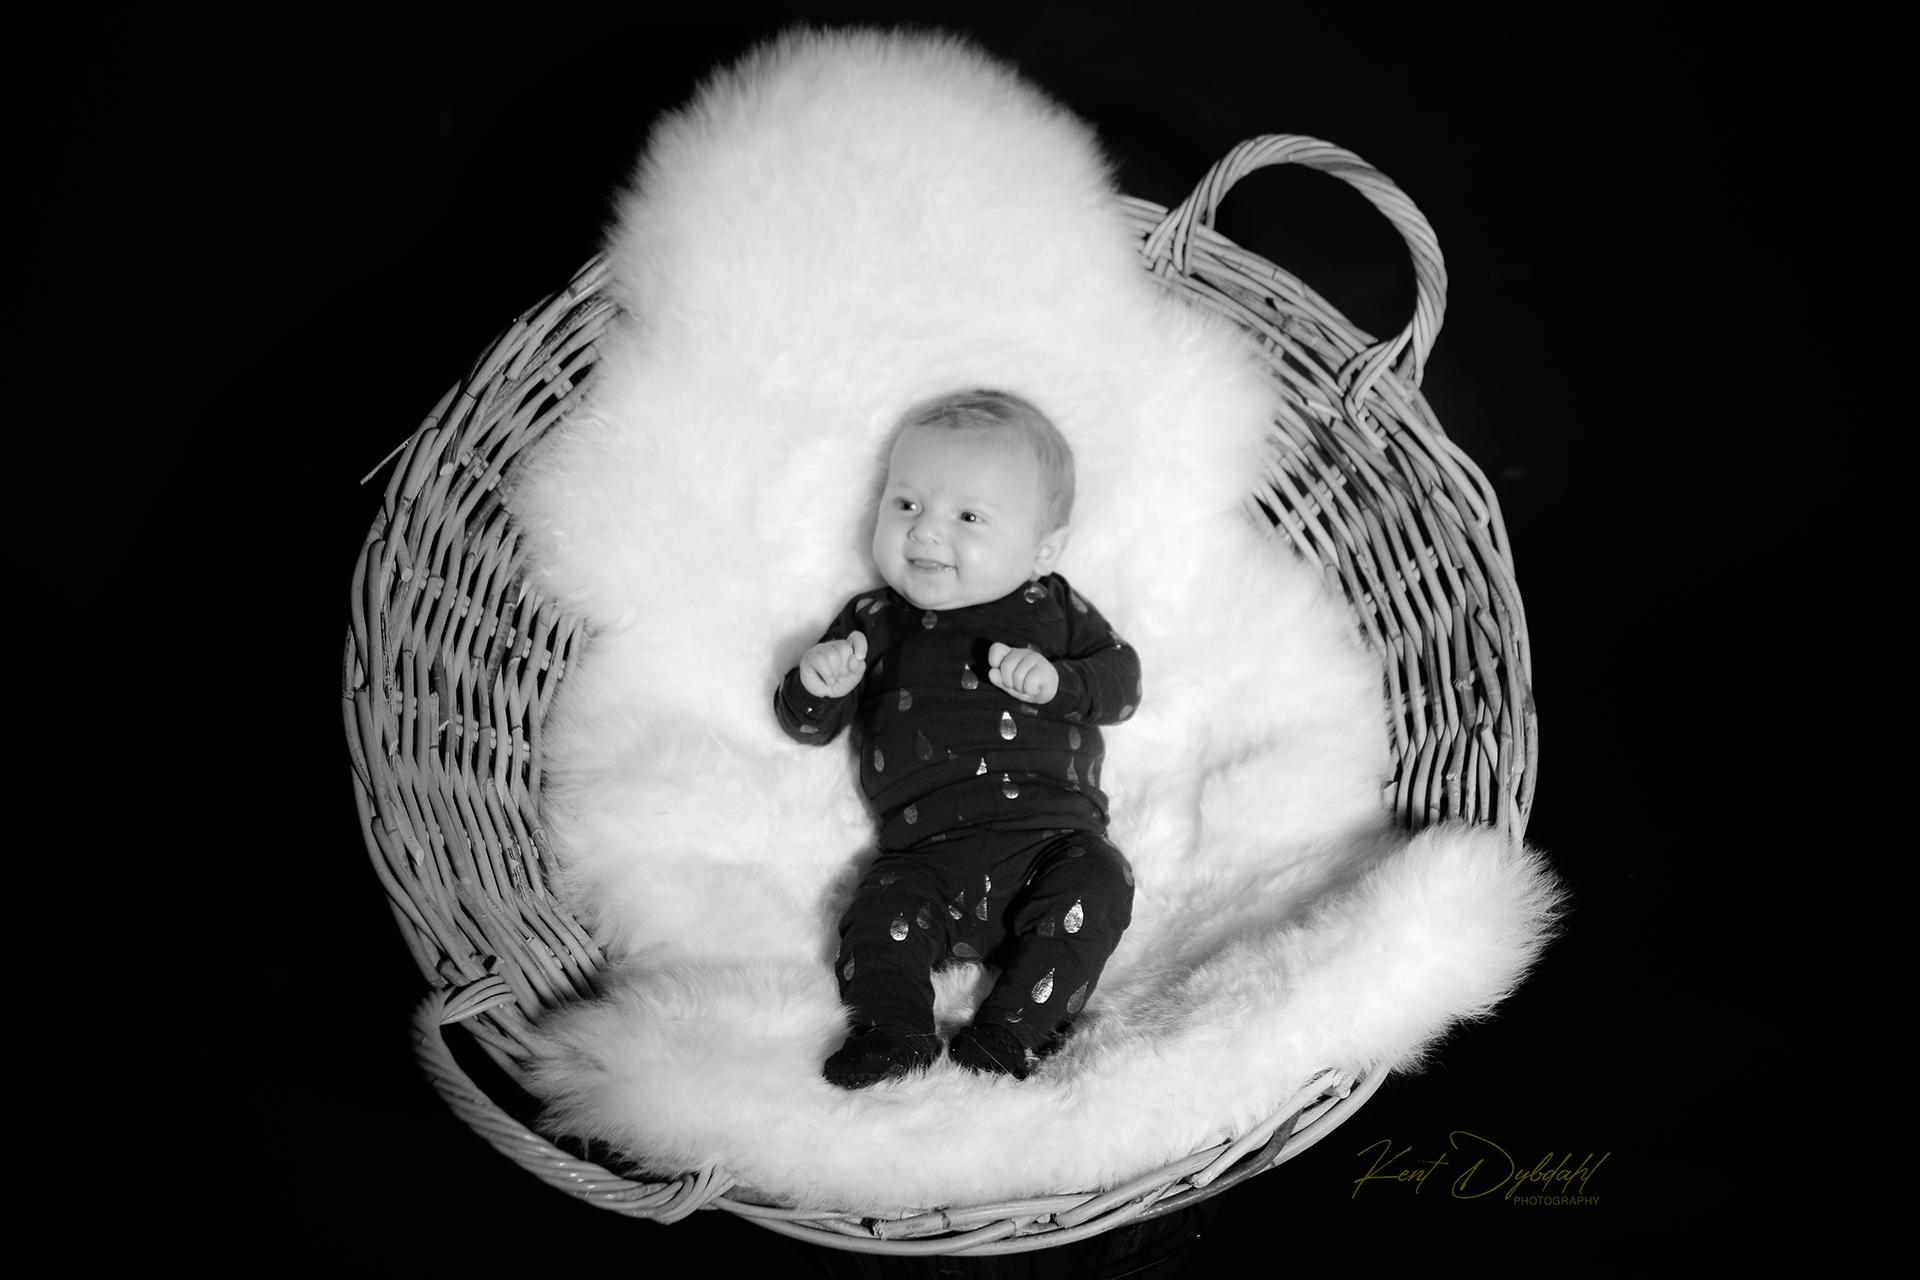 © Fotos Børn dybdahls.dk.5